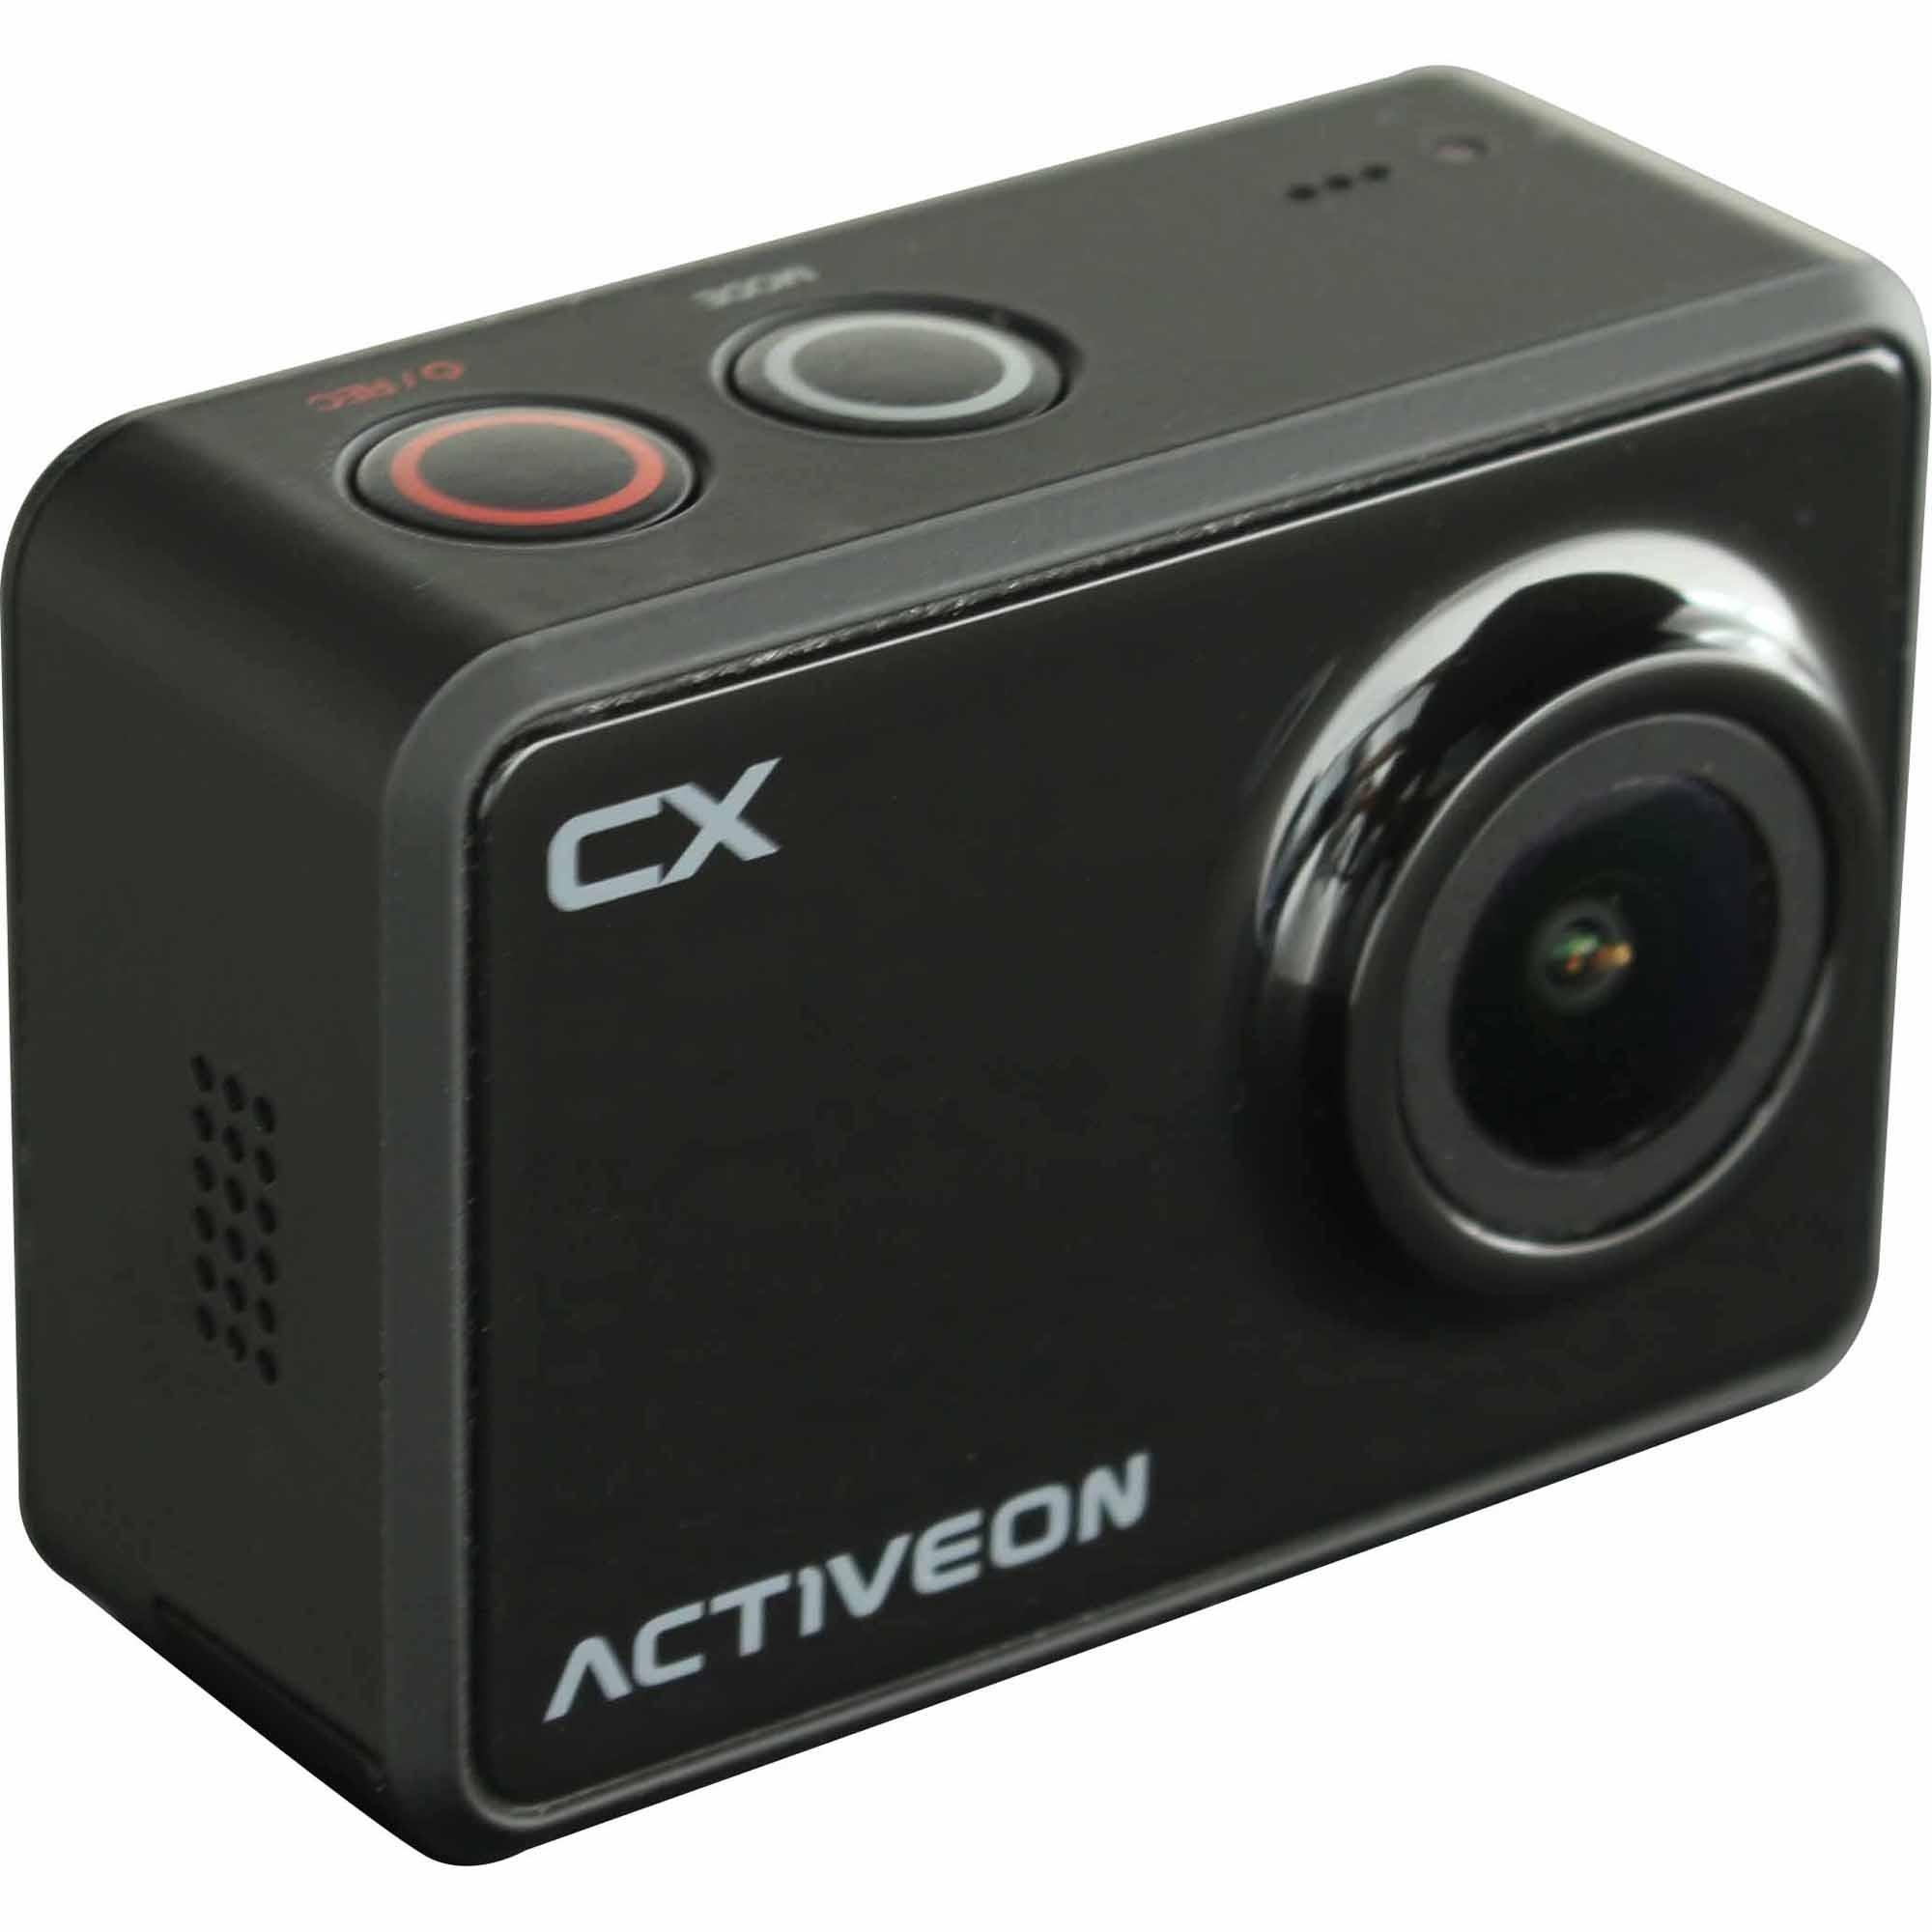 ACTIVEON 5-Megapixel Action Cam CX w/ Built-In WiFi - Black PartNumber: 00352341000P KsnValue: 00352341000 MfgPartNumber: CCA10W